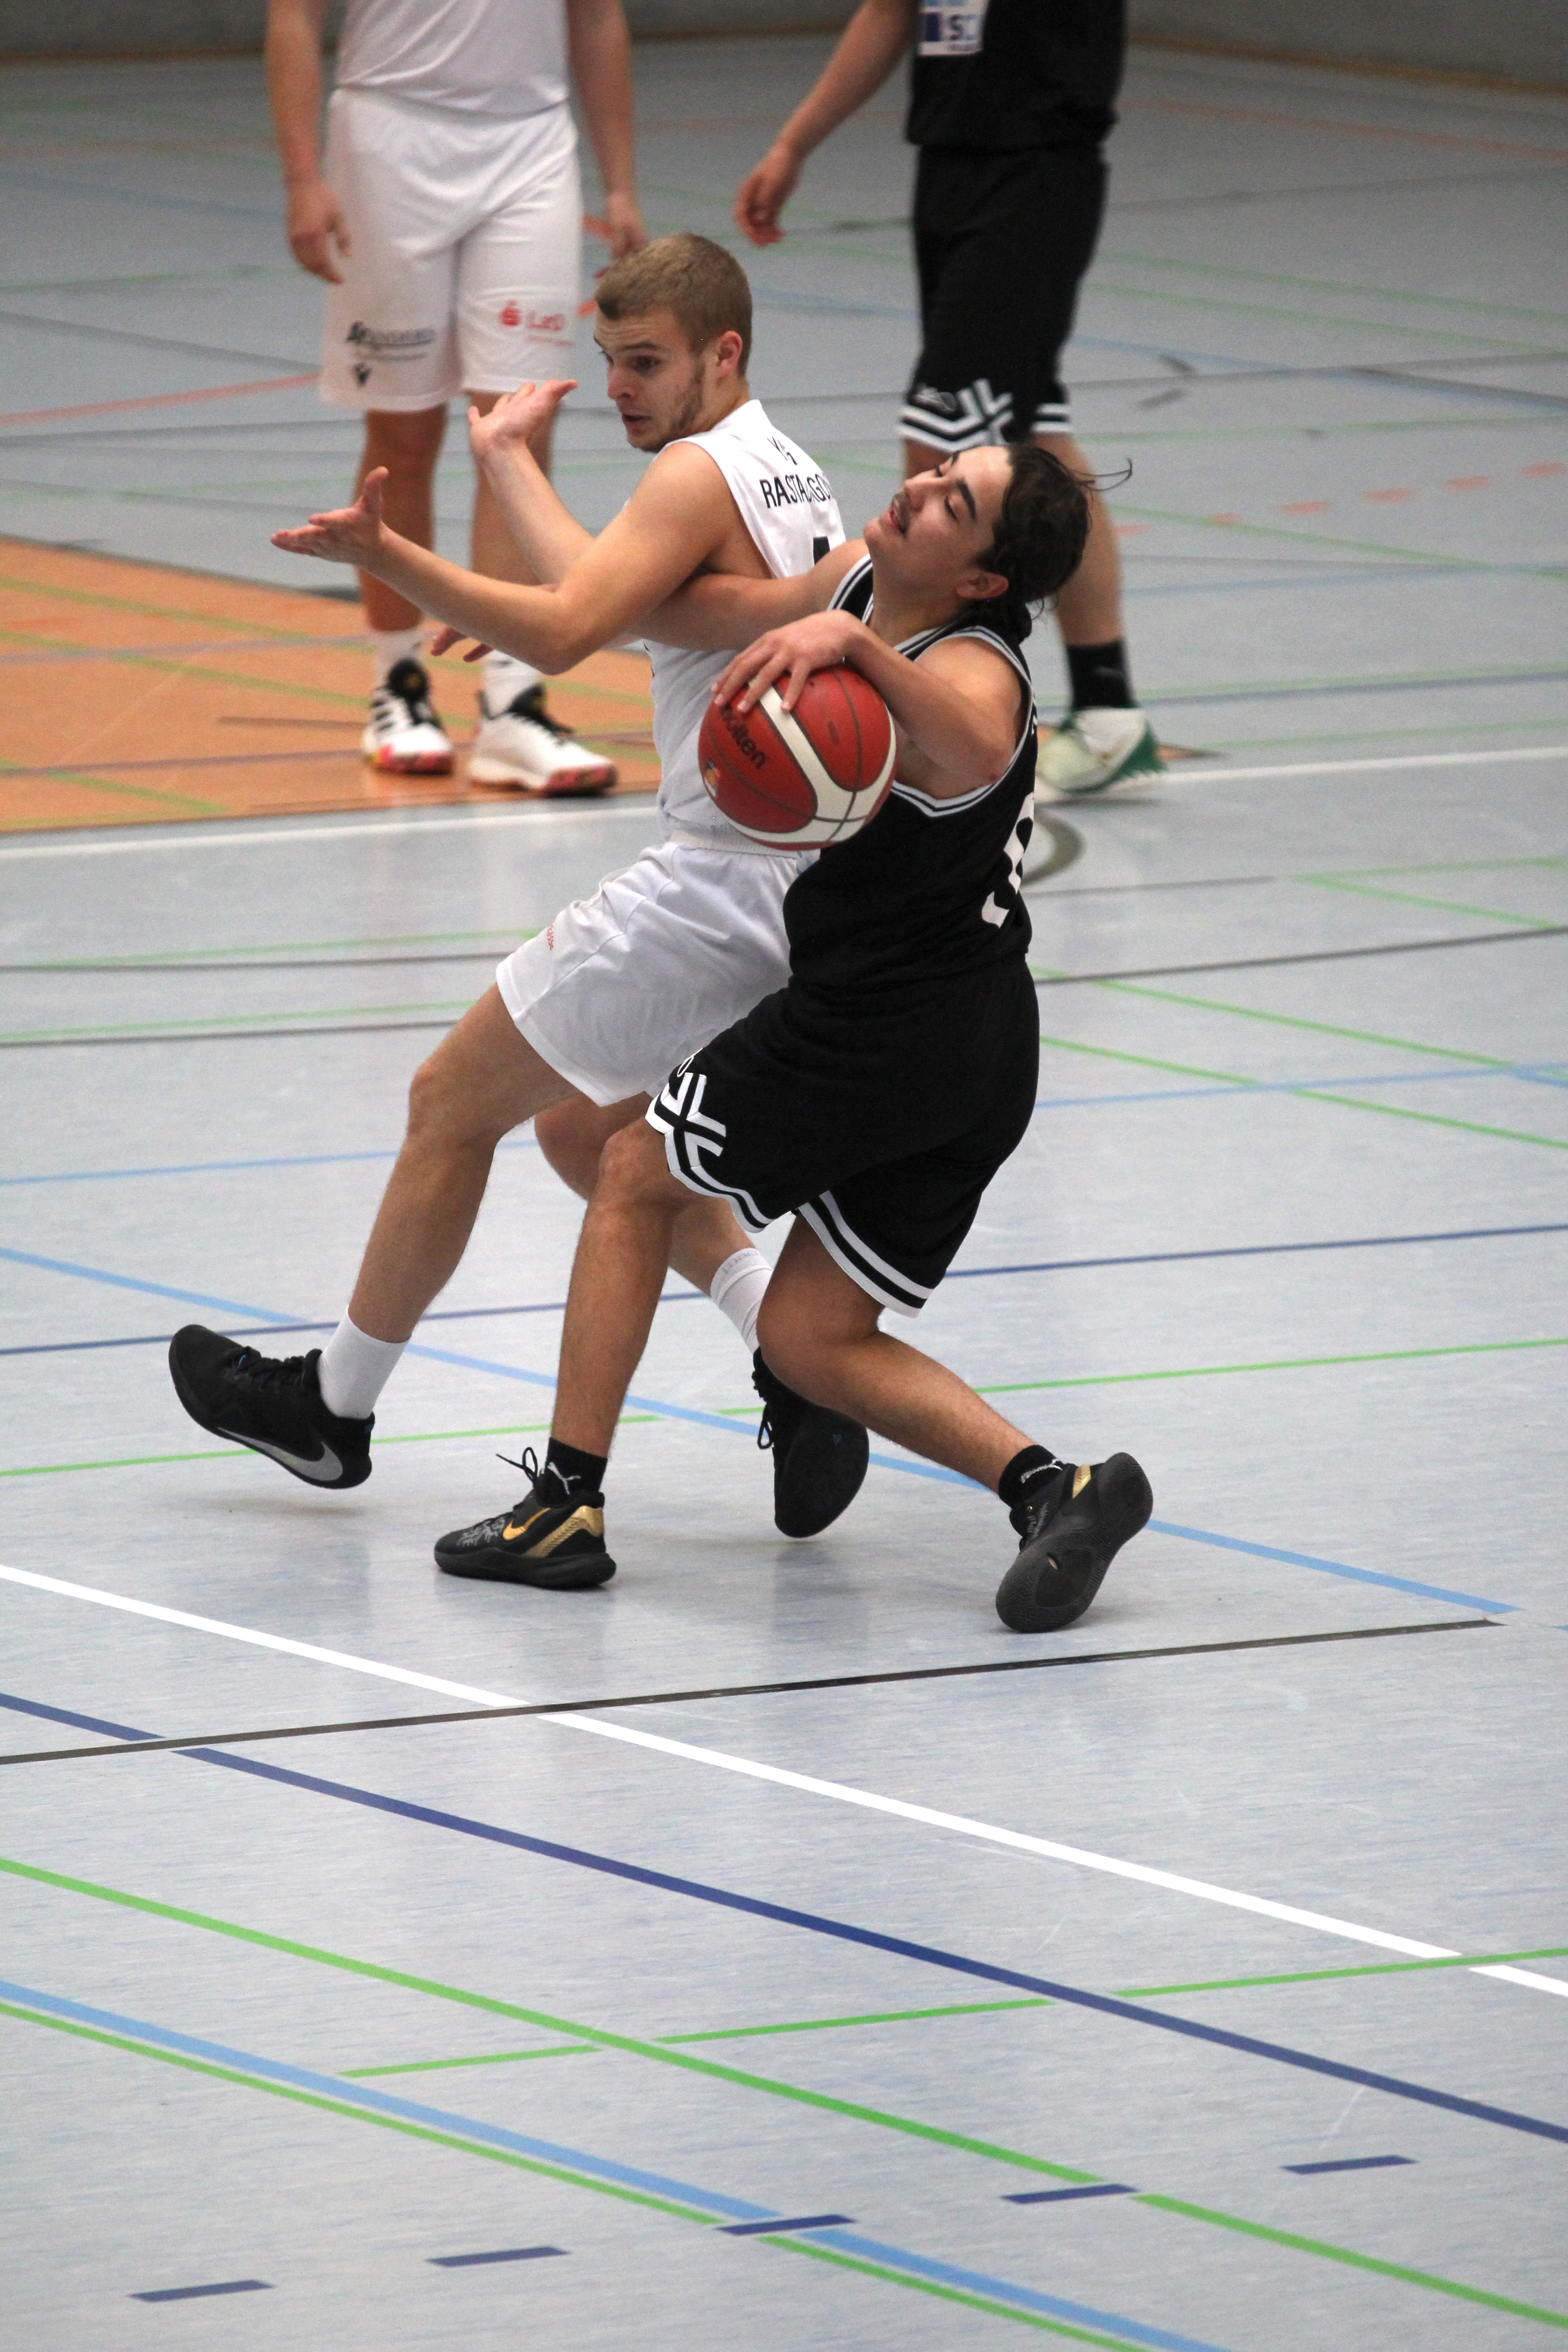 NBBL_20-21_YOUNG-RASTA-DRAGONS_Münster_Spieltag1_Torge-Buthmann_8